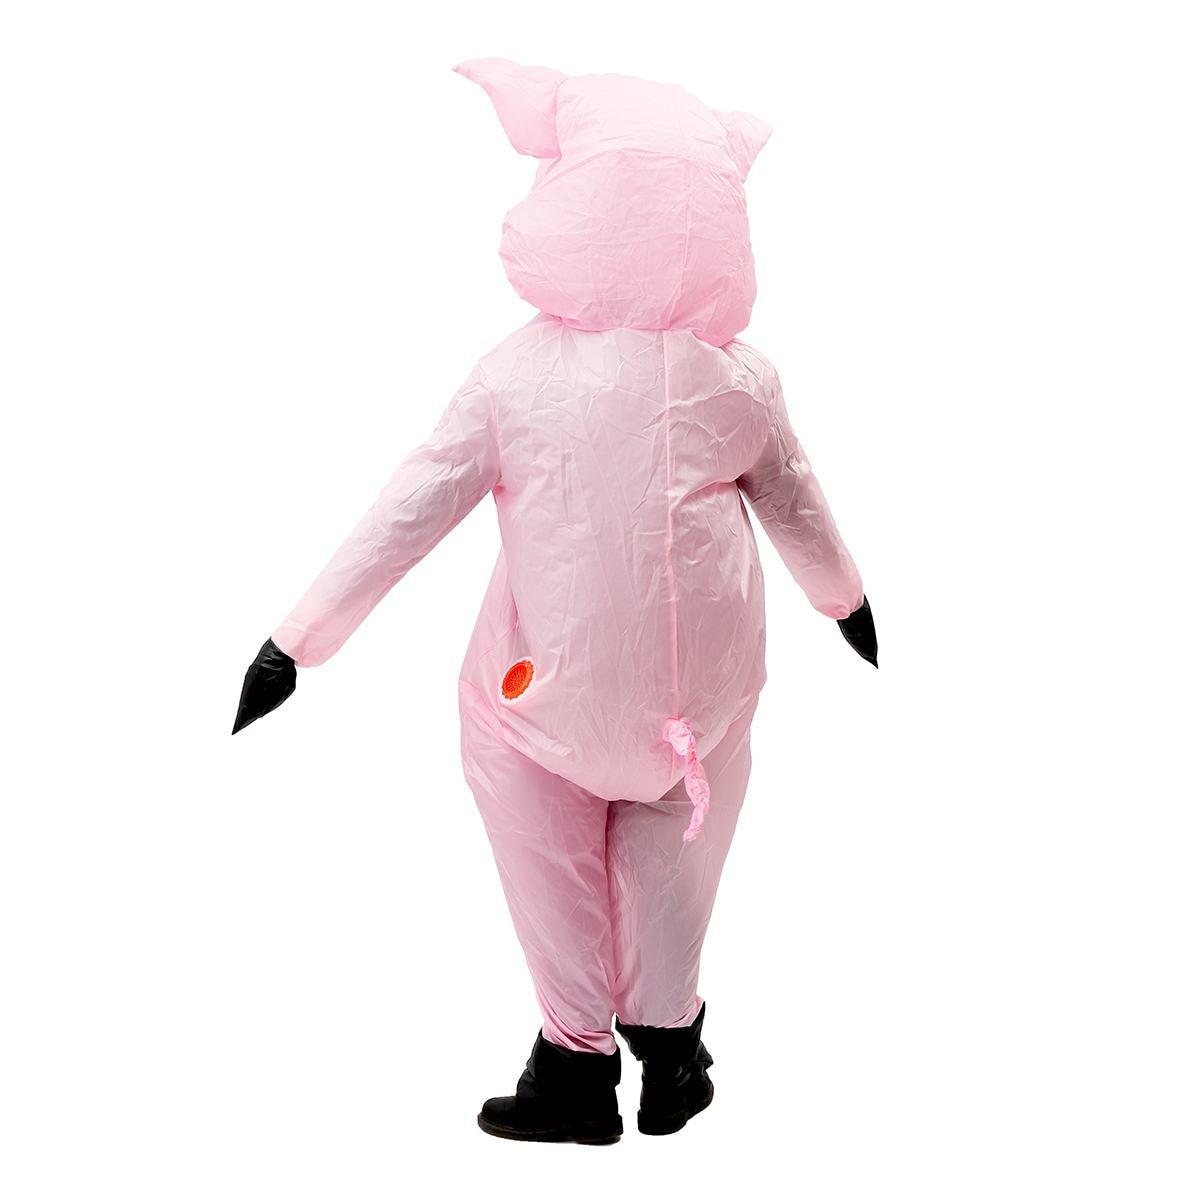 Pig Nose Snout Saw Animal Latex Fancy Dress Costume oink not inc x 2pcs SET